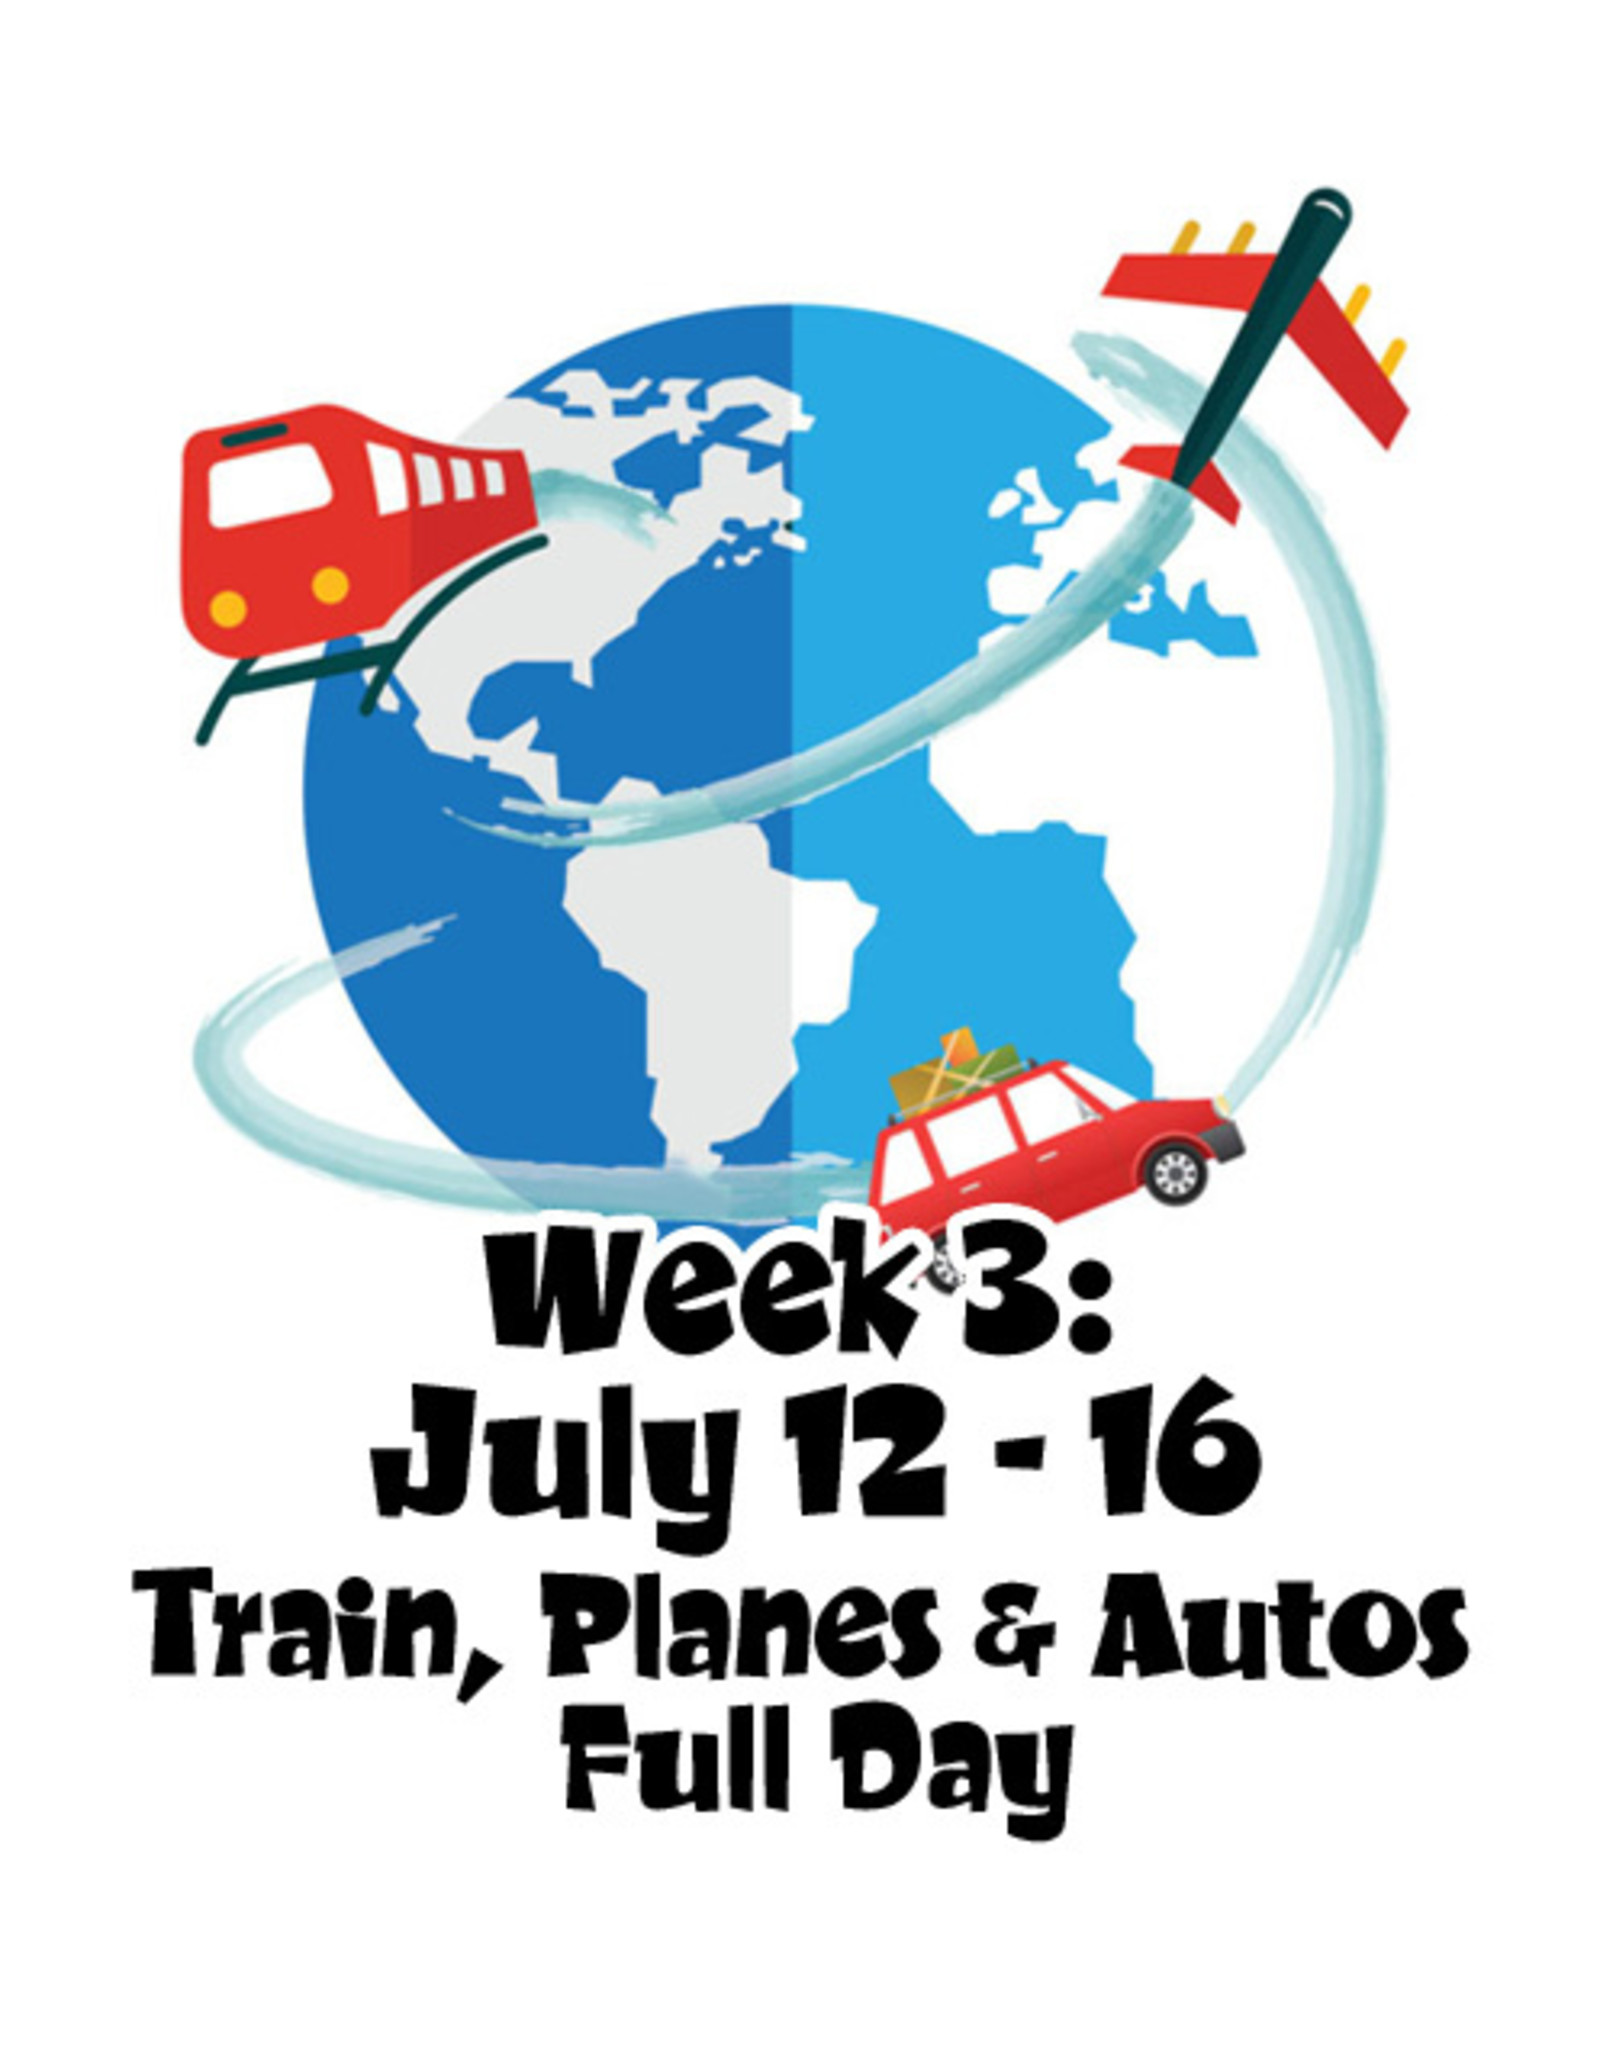 2021 Art Camp 2021 Art Camp Wk Three July 12 - July 16 Full Day